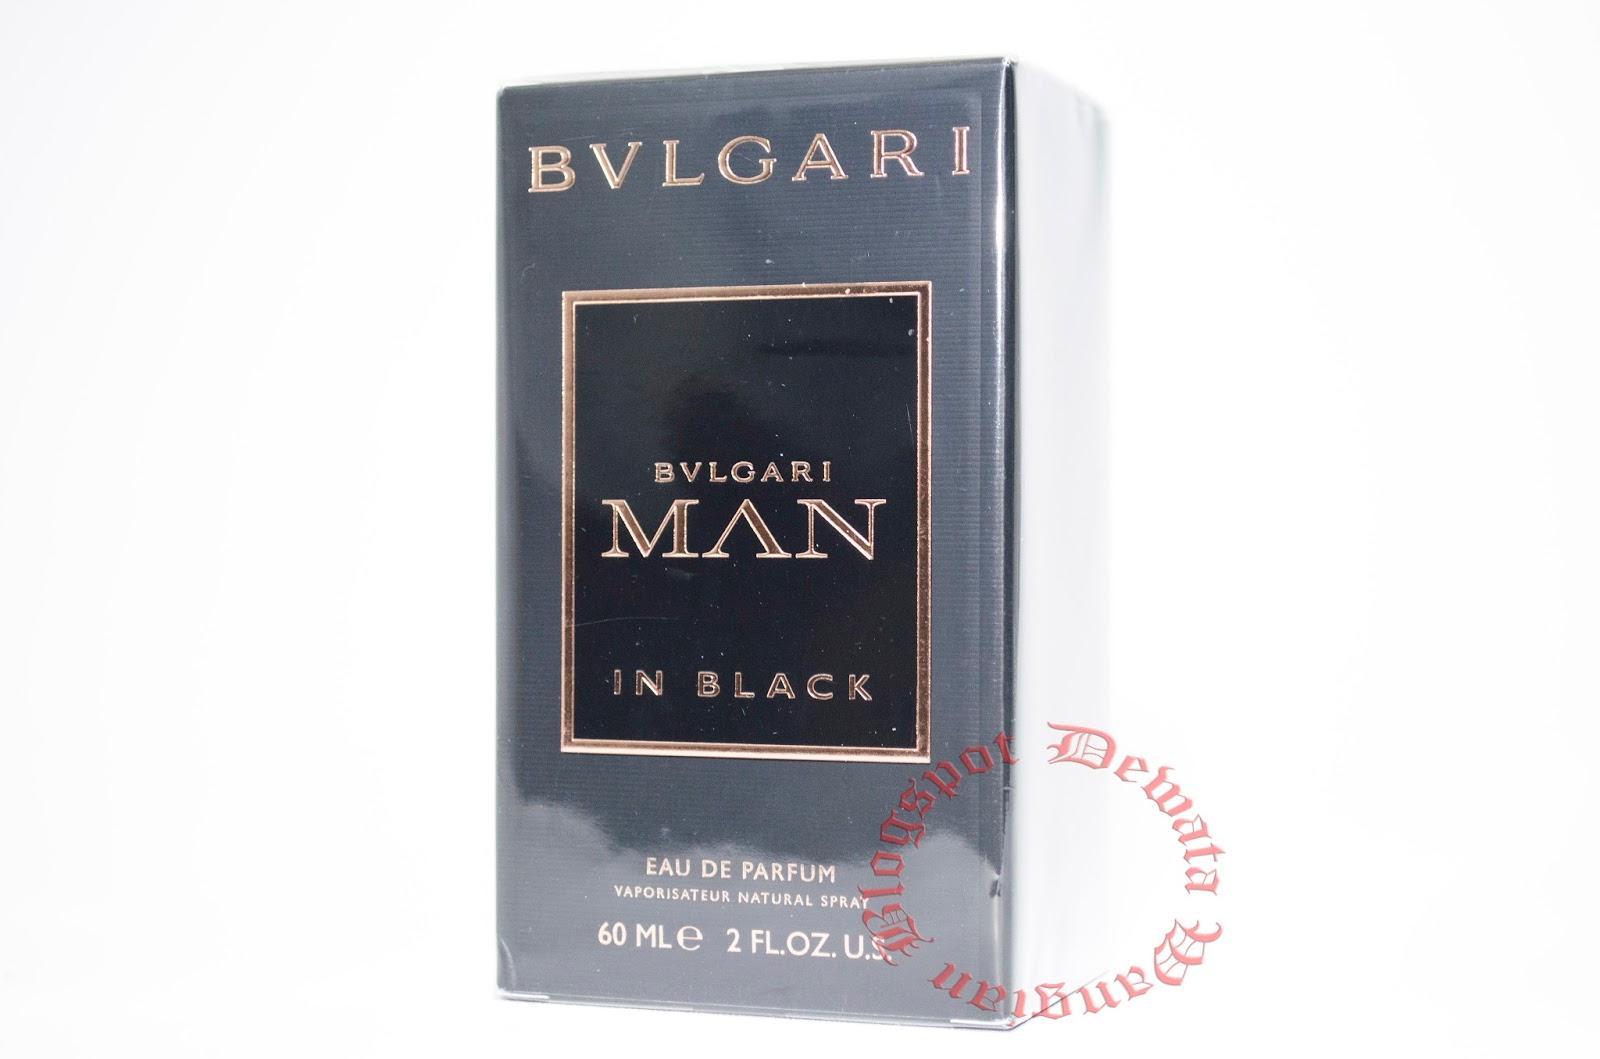 Perfumes For Guys V4 Evelyn Parfum Riject Imghttp 1bpblogspotcom 7jqtskdh9he Vjbjnp6w9vi Aaaaaaaae Q Yzswryueio8 S1600 Bvlgarimaninblack60ml